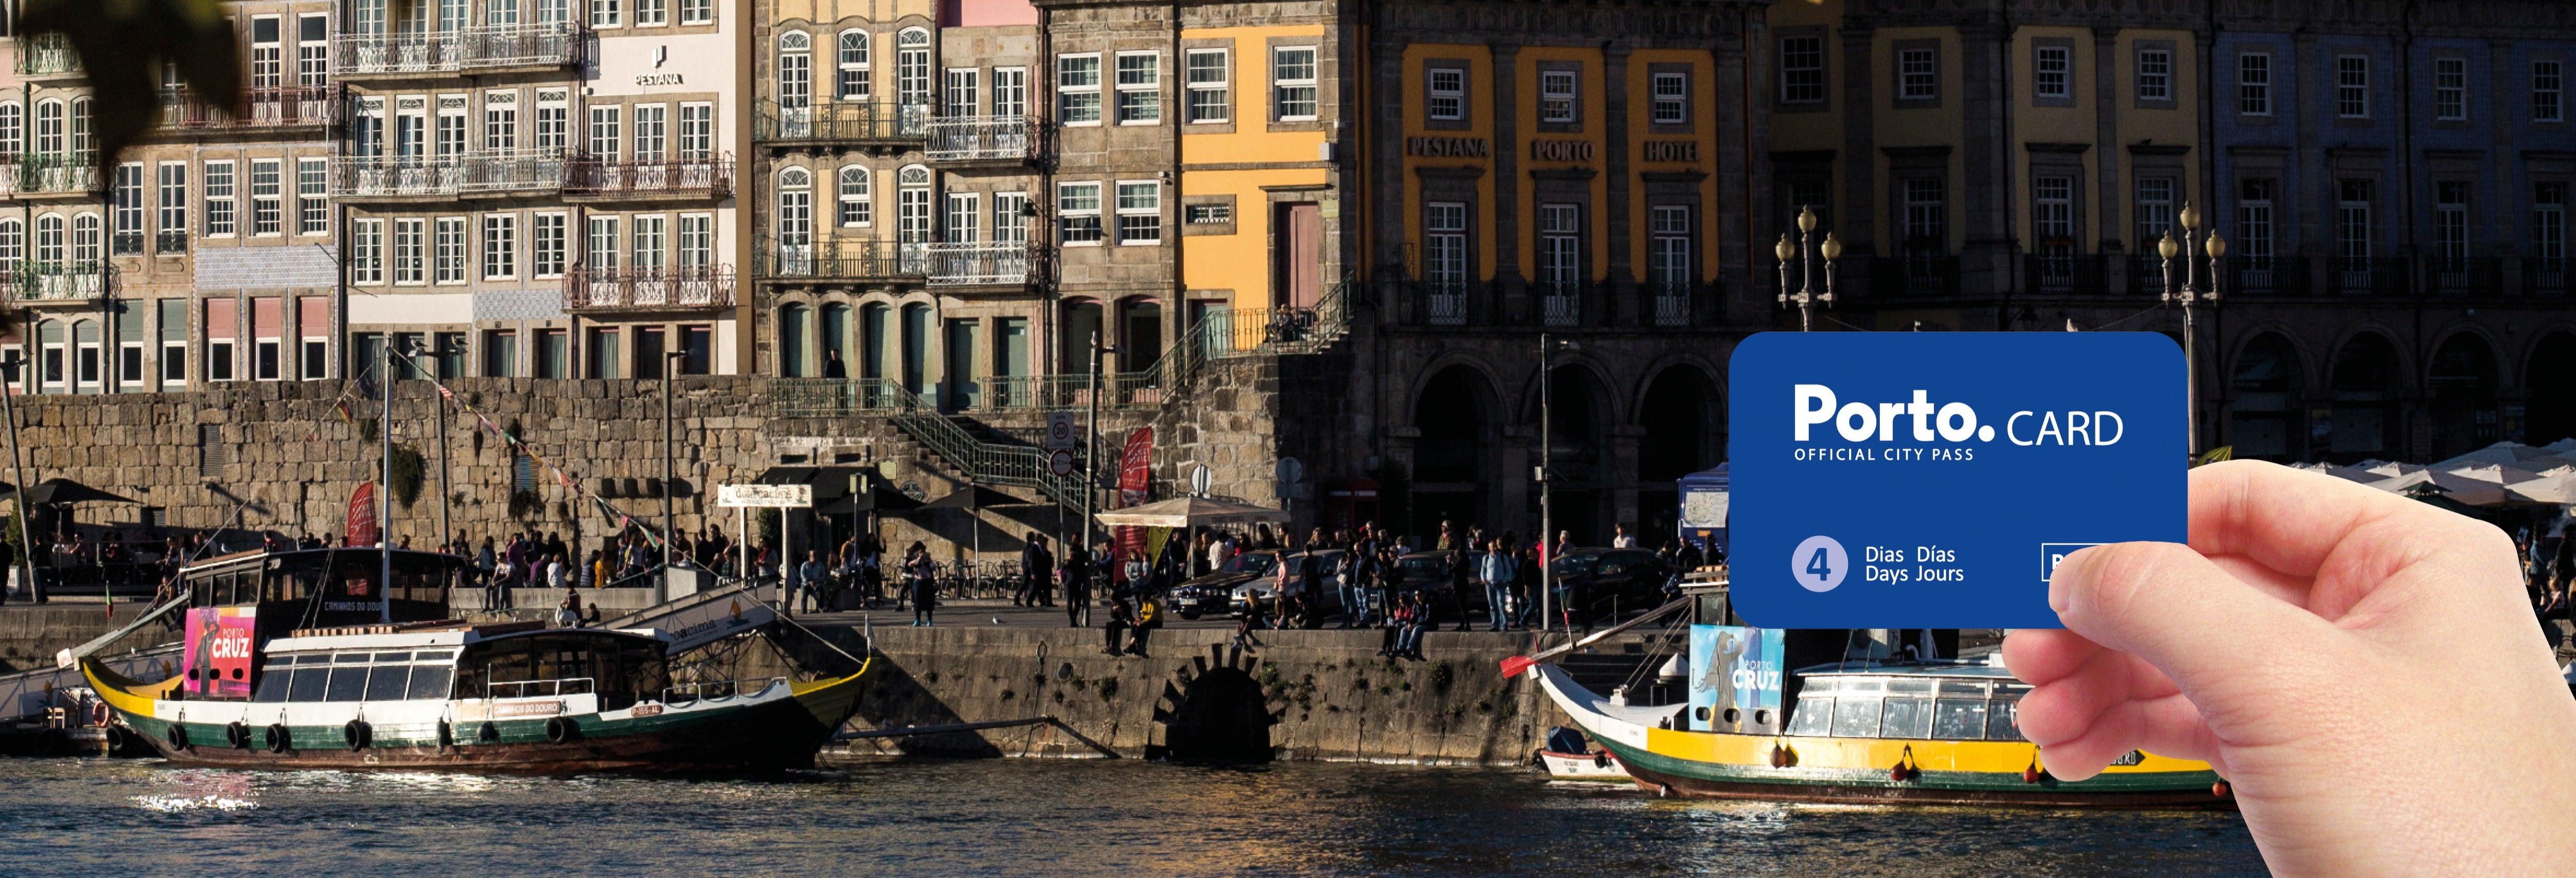 Porto Card